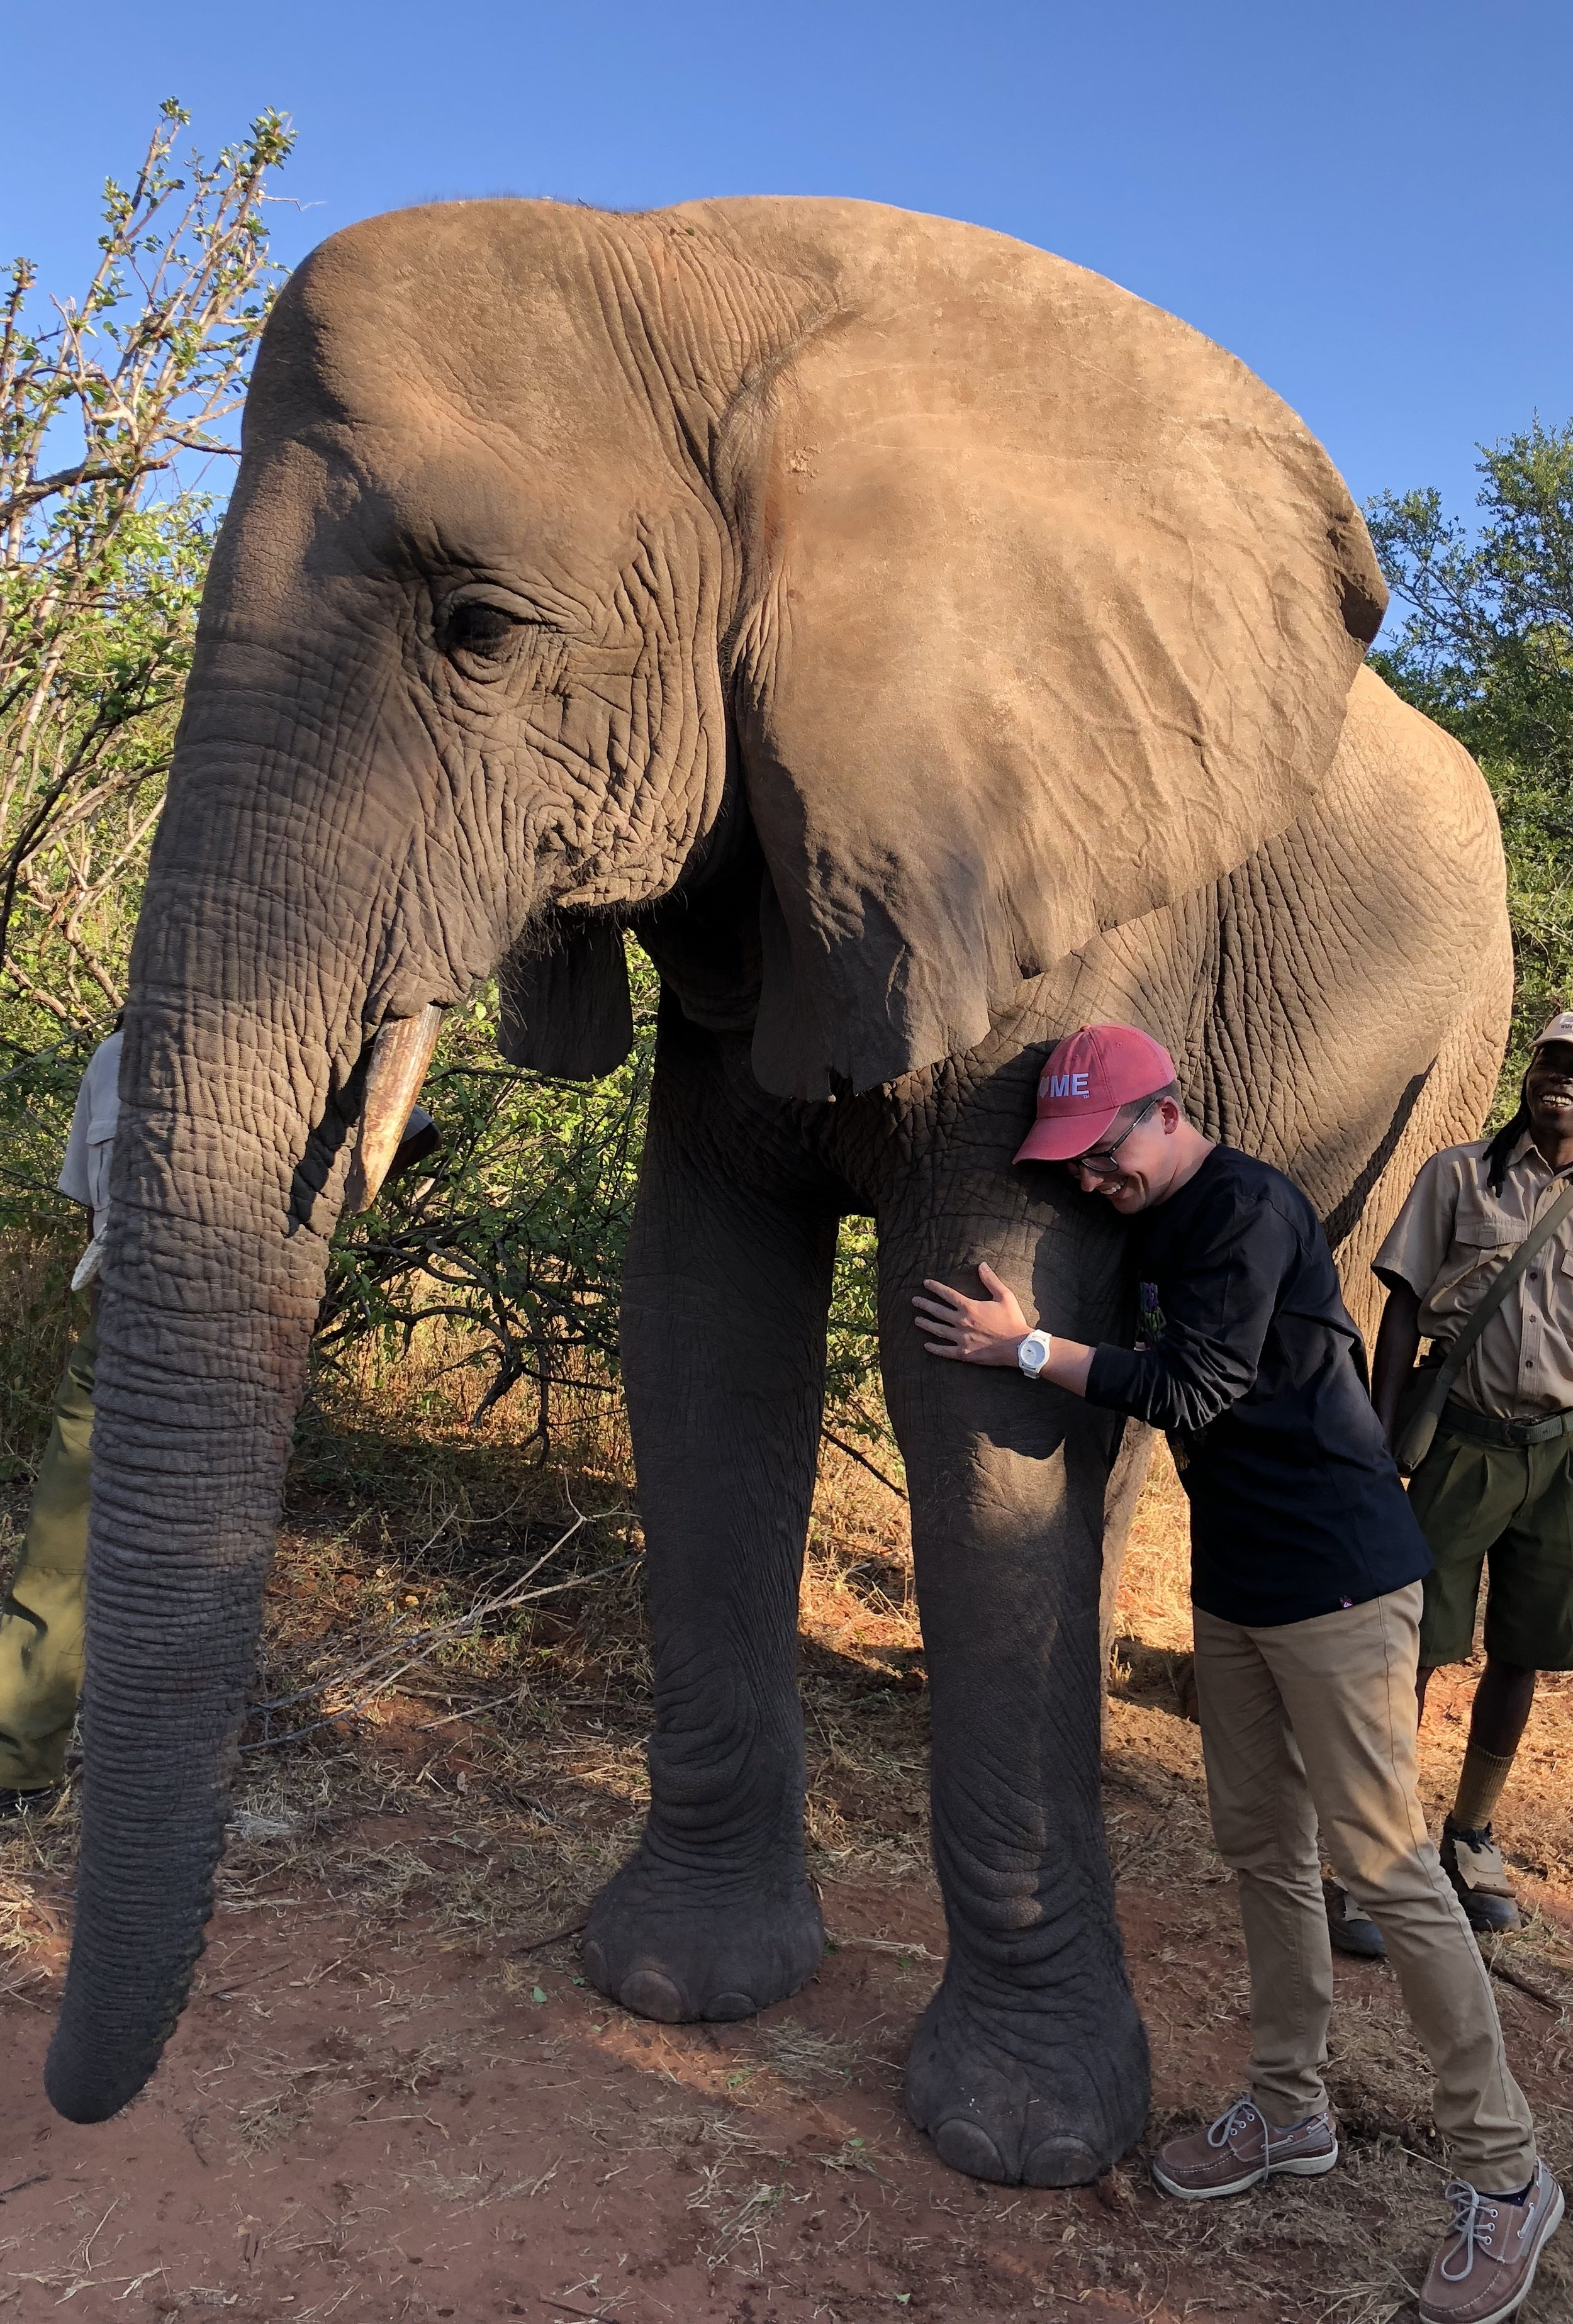 Cameron hugs a domesticated elephant in a Zimbabwean wildlife orphanage